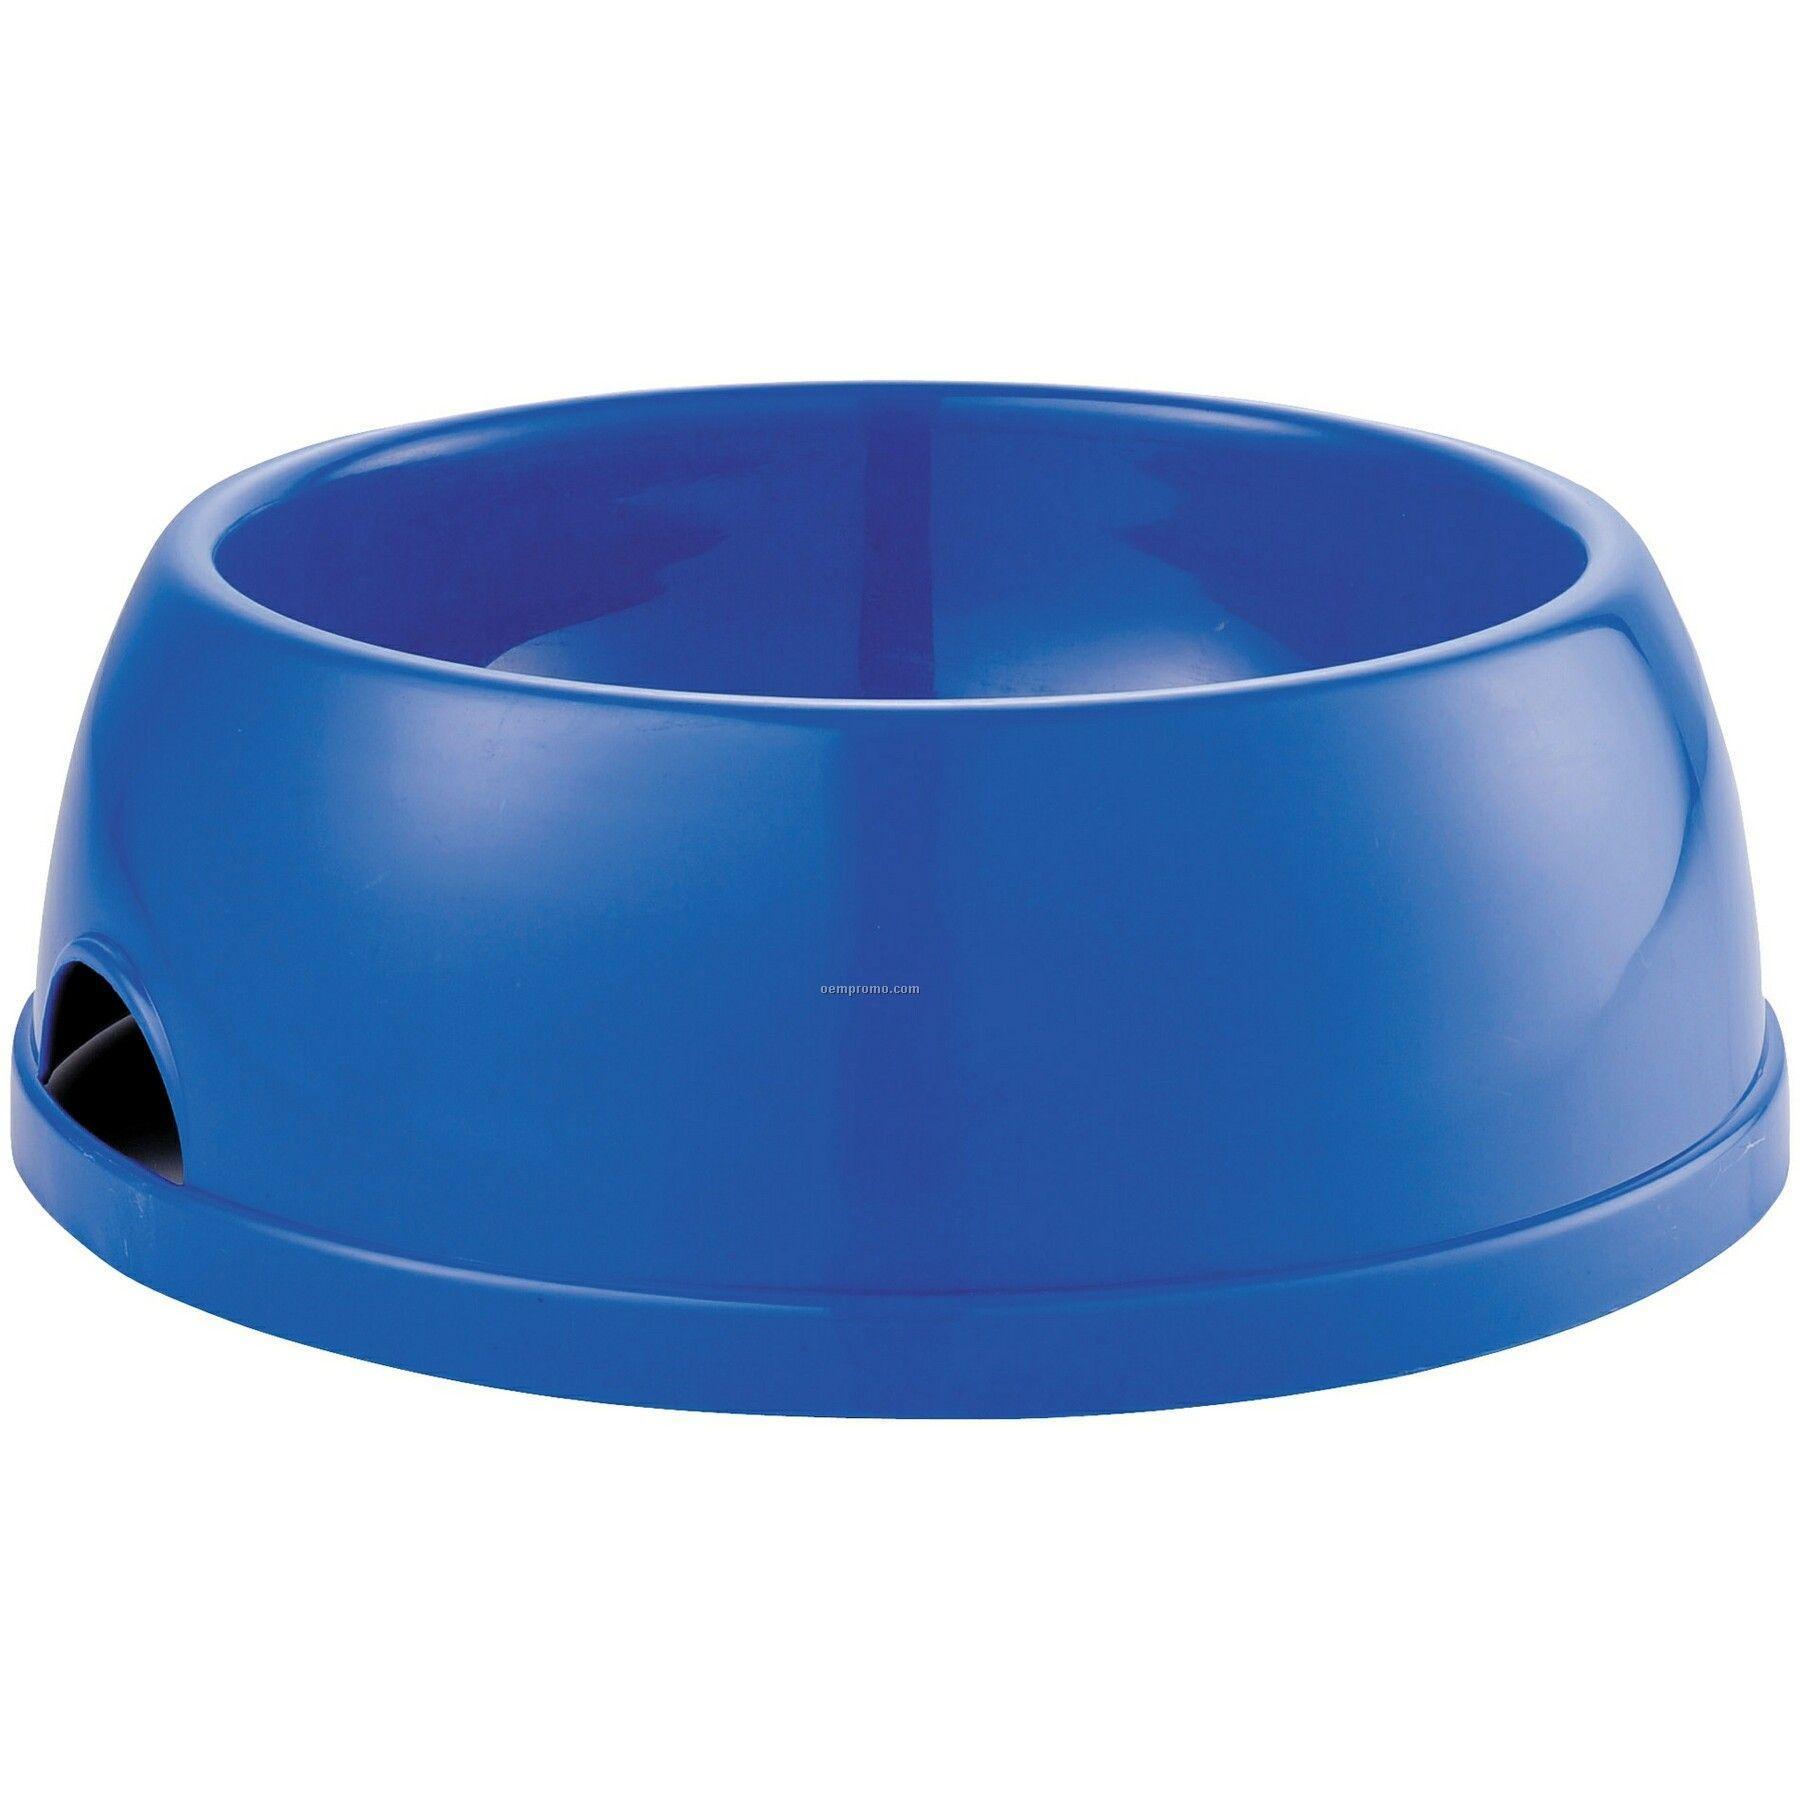 Glass Cat Food Bowls